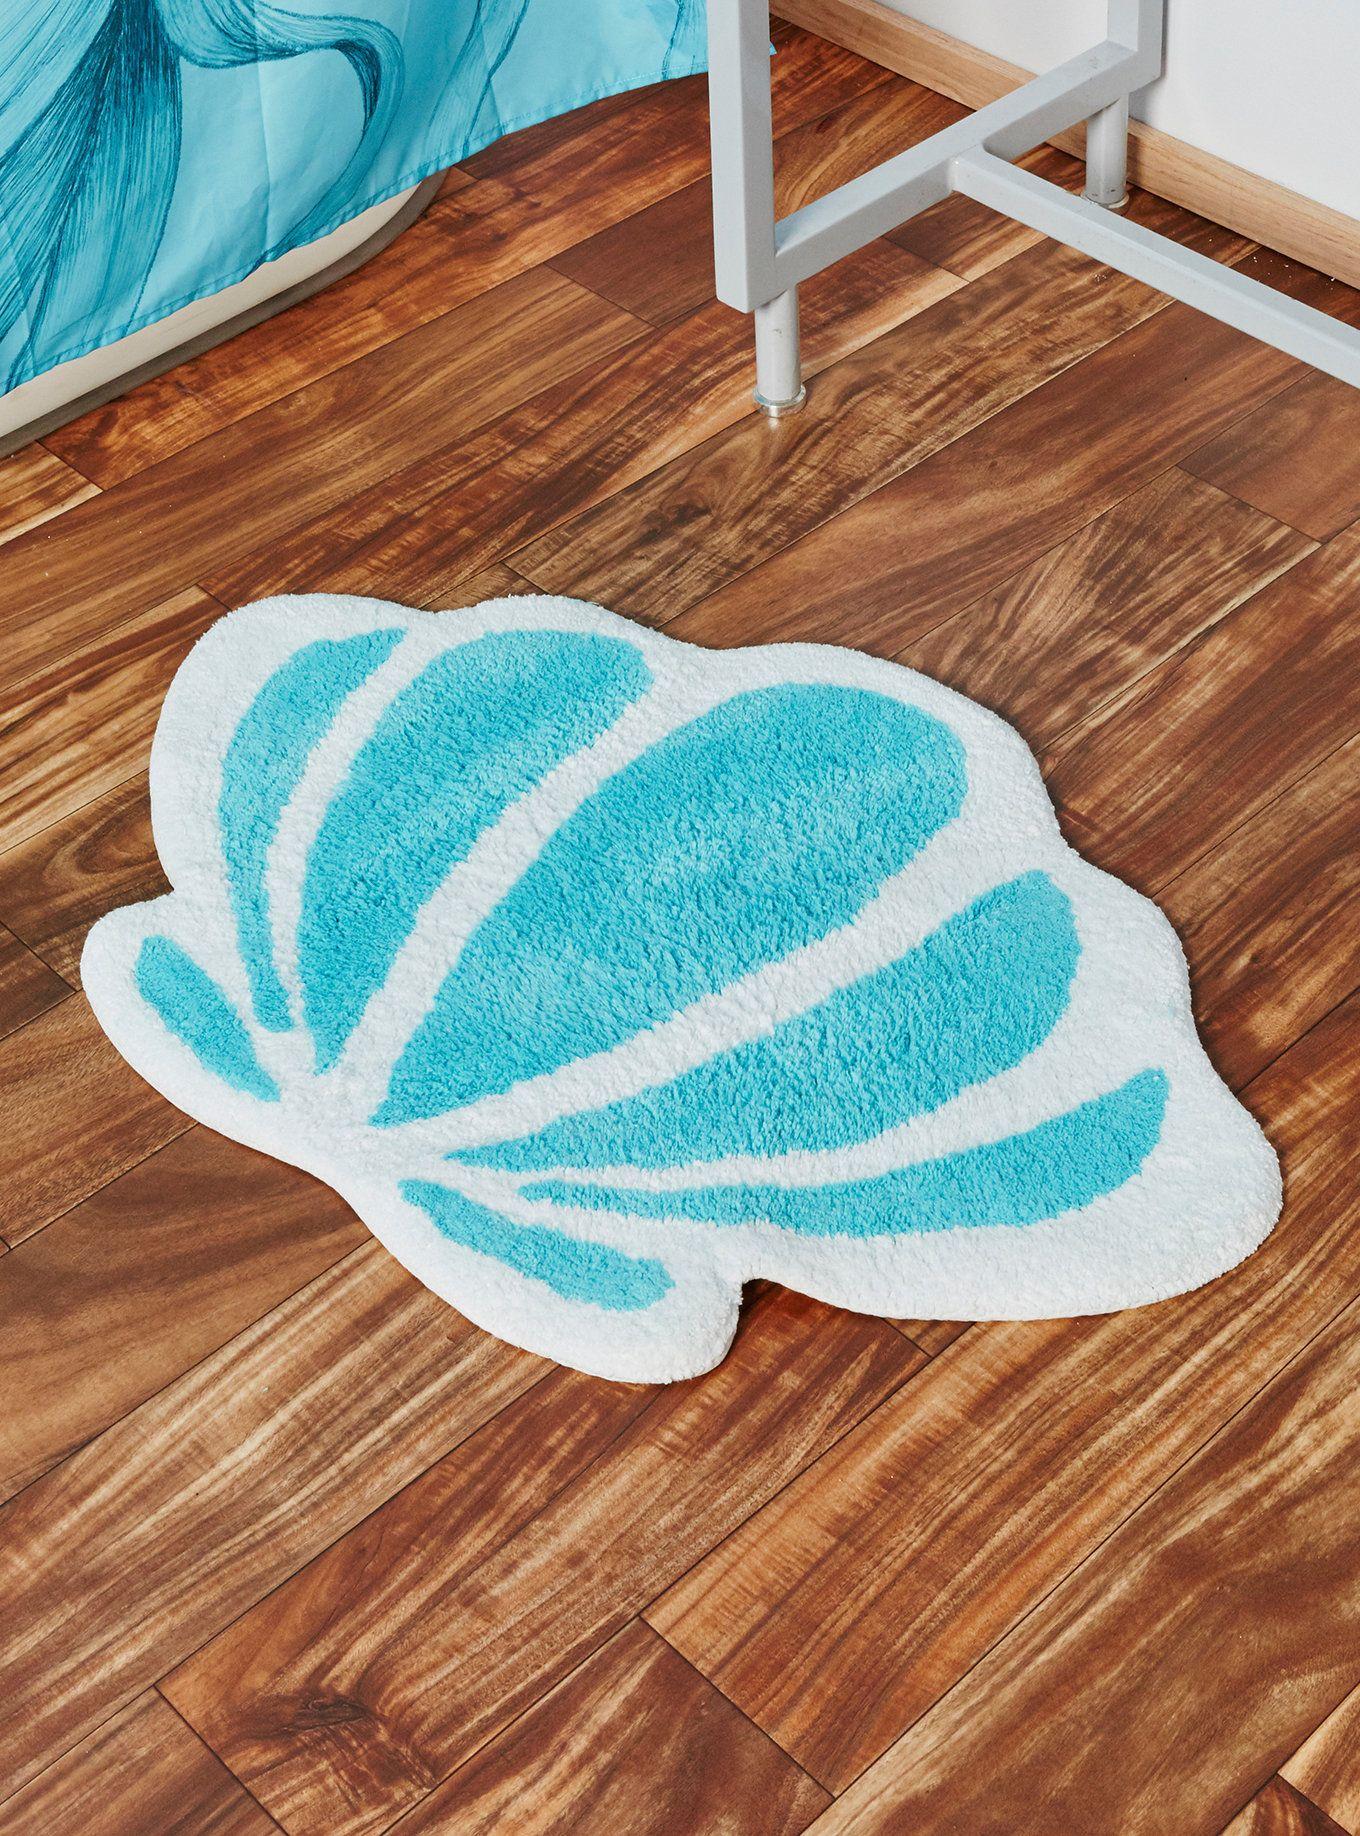 Disney The Little Mermaid Seashell Bath Rug Seashell Bath Rug